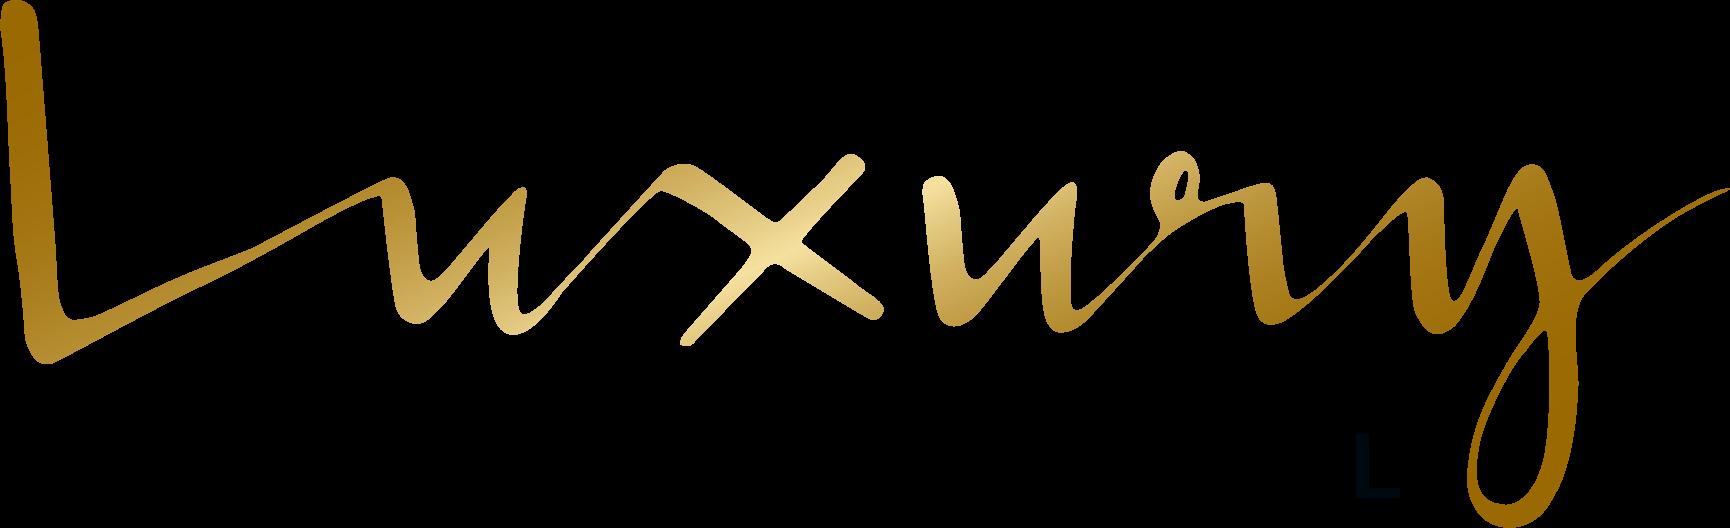 KW_LuxuryInternational_Logo_RGB_K-Gold.png